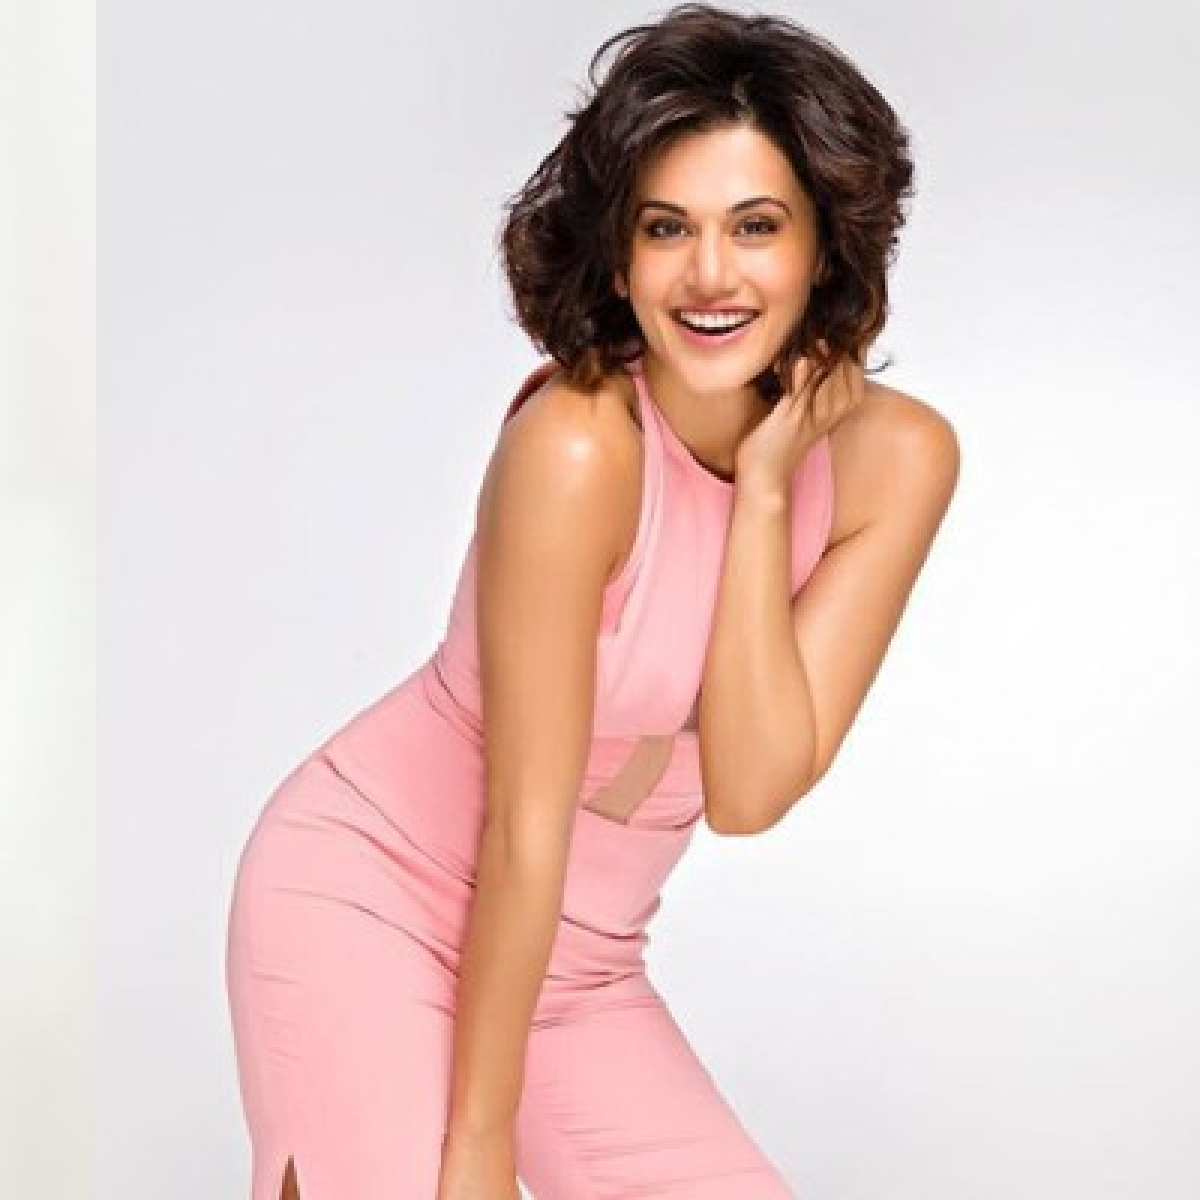 Taapsee Pannu to replace Samantha Akkineni in Hindi remake of 'U Turn'?